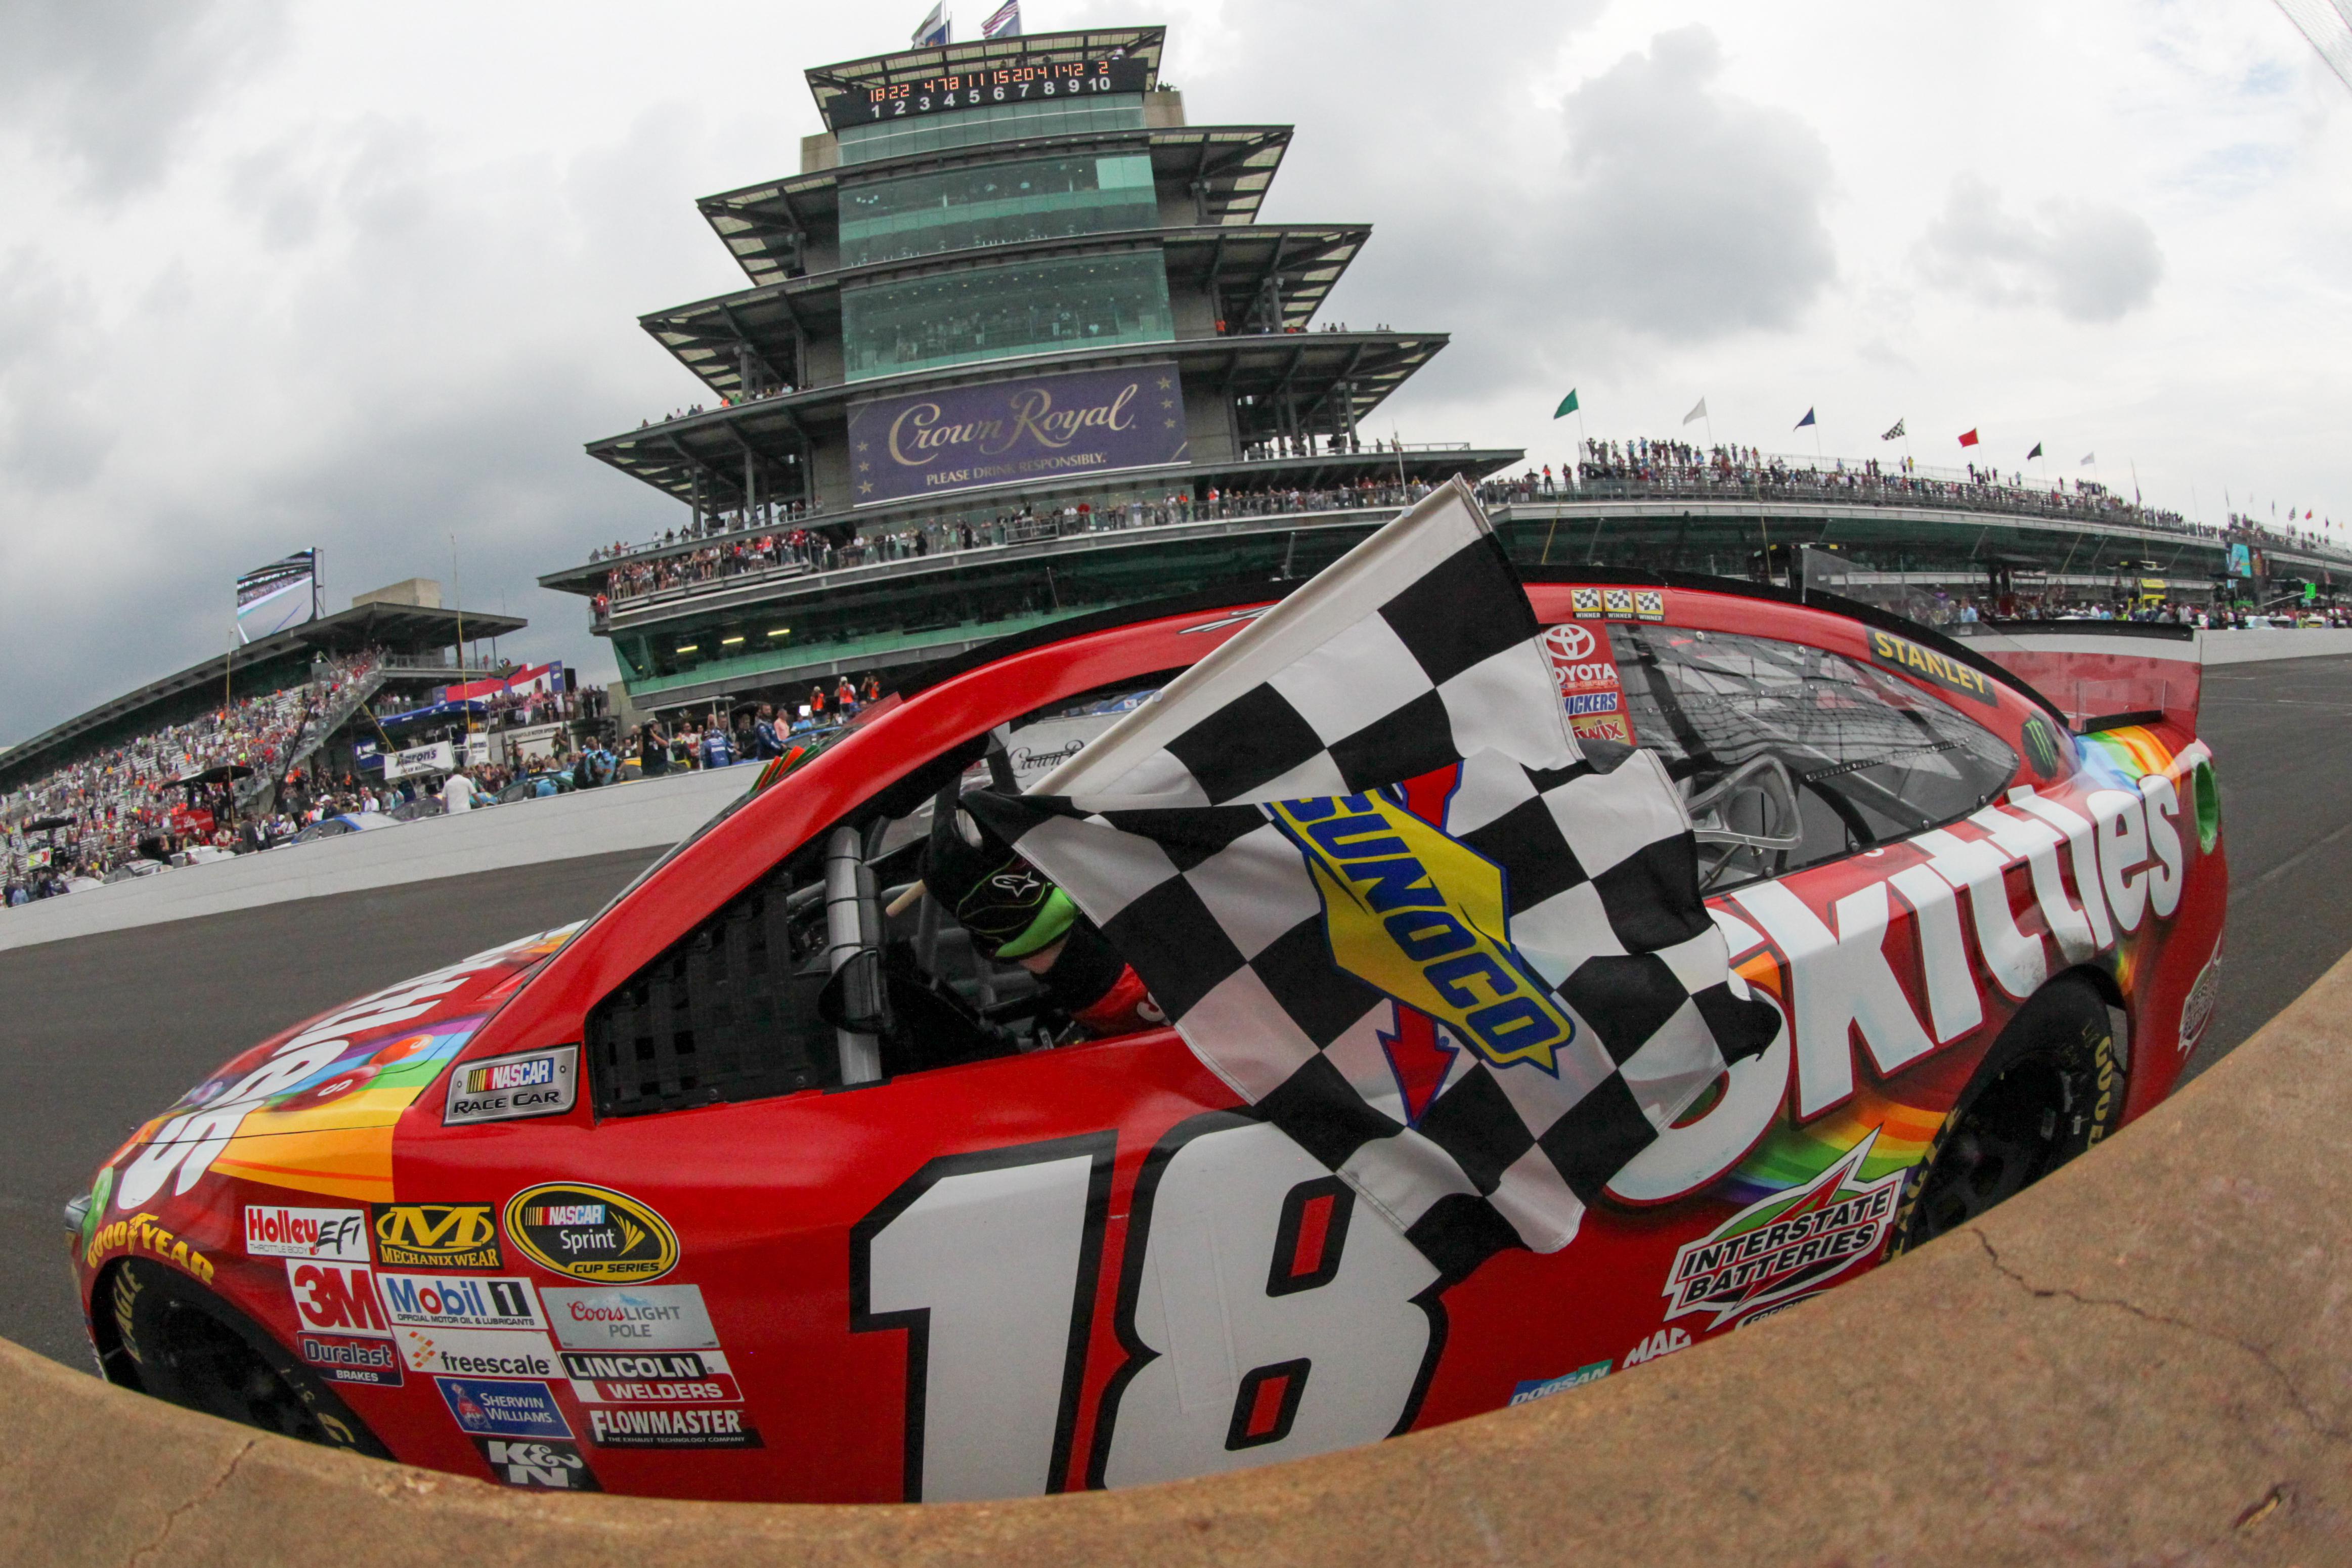 Kyle busch sweeps nascar indianapolis motor speedway for Indianapolis motor speedway indianapolis in